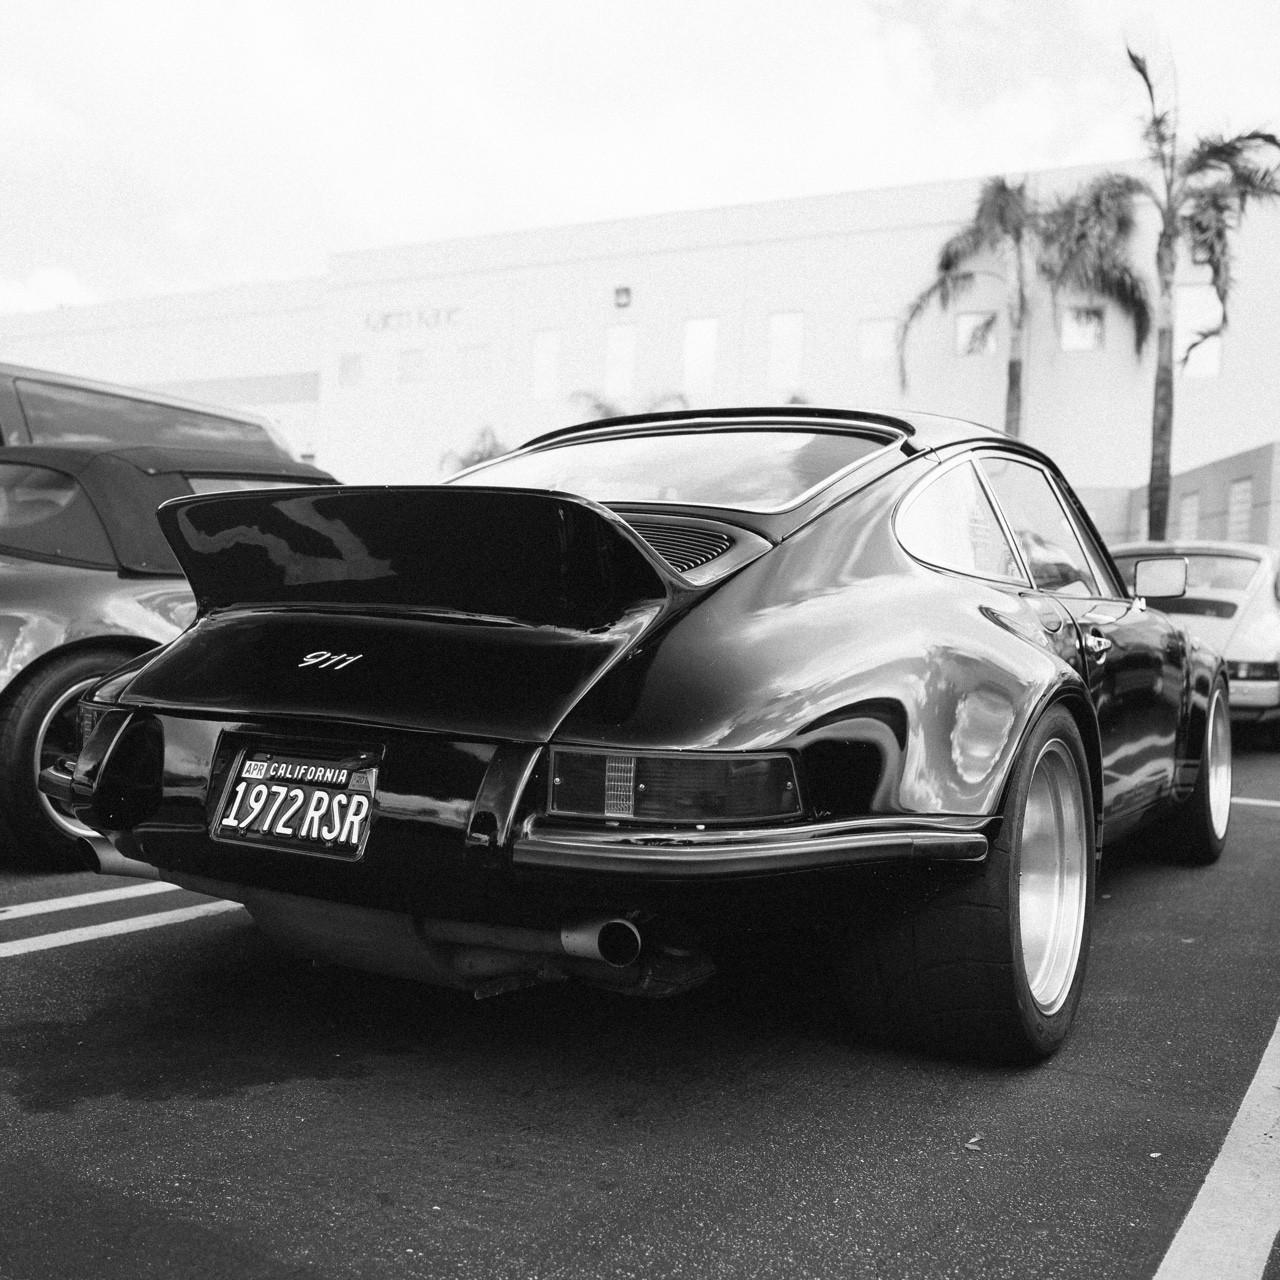 Wallpaper : old school wheels, palm trees, filter, Porsche 911 ...